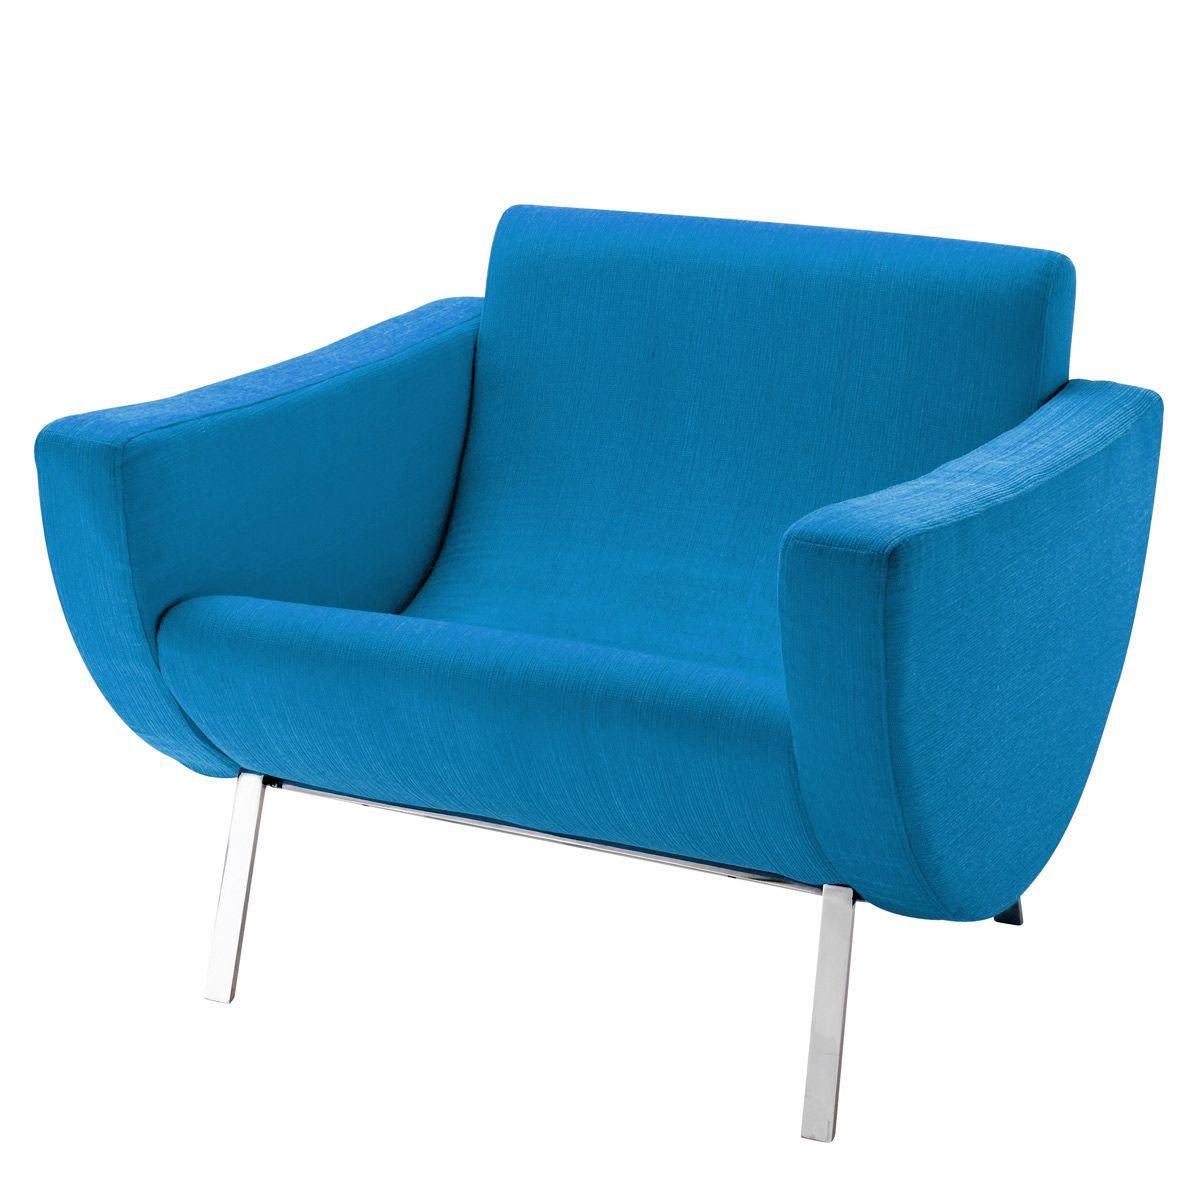 Amazon Queen Bleu fauteuil vintage bleu guariche mandarine | blue armchair